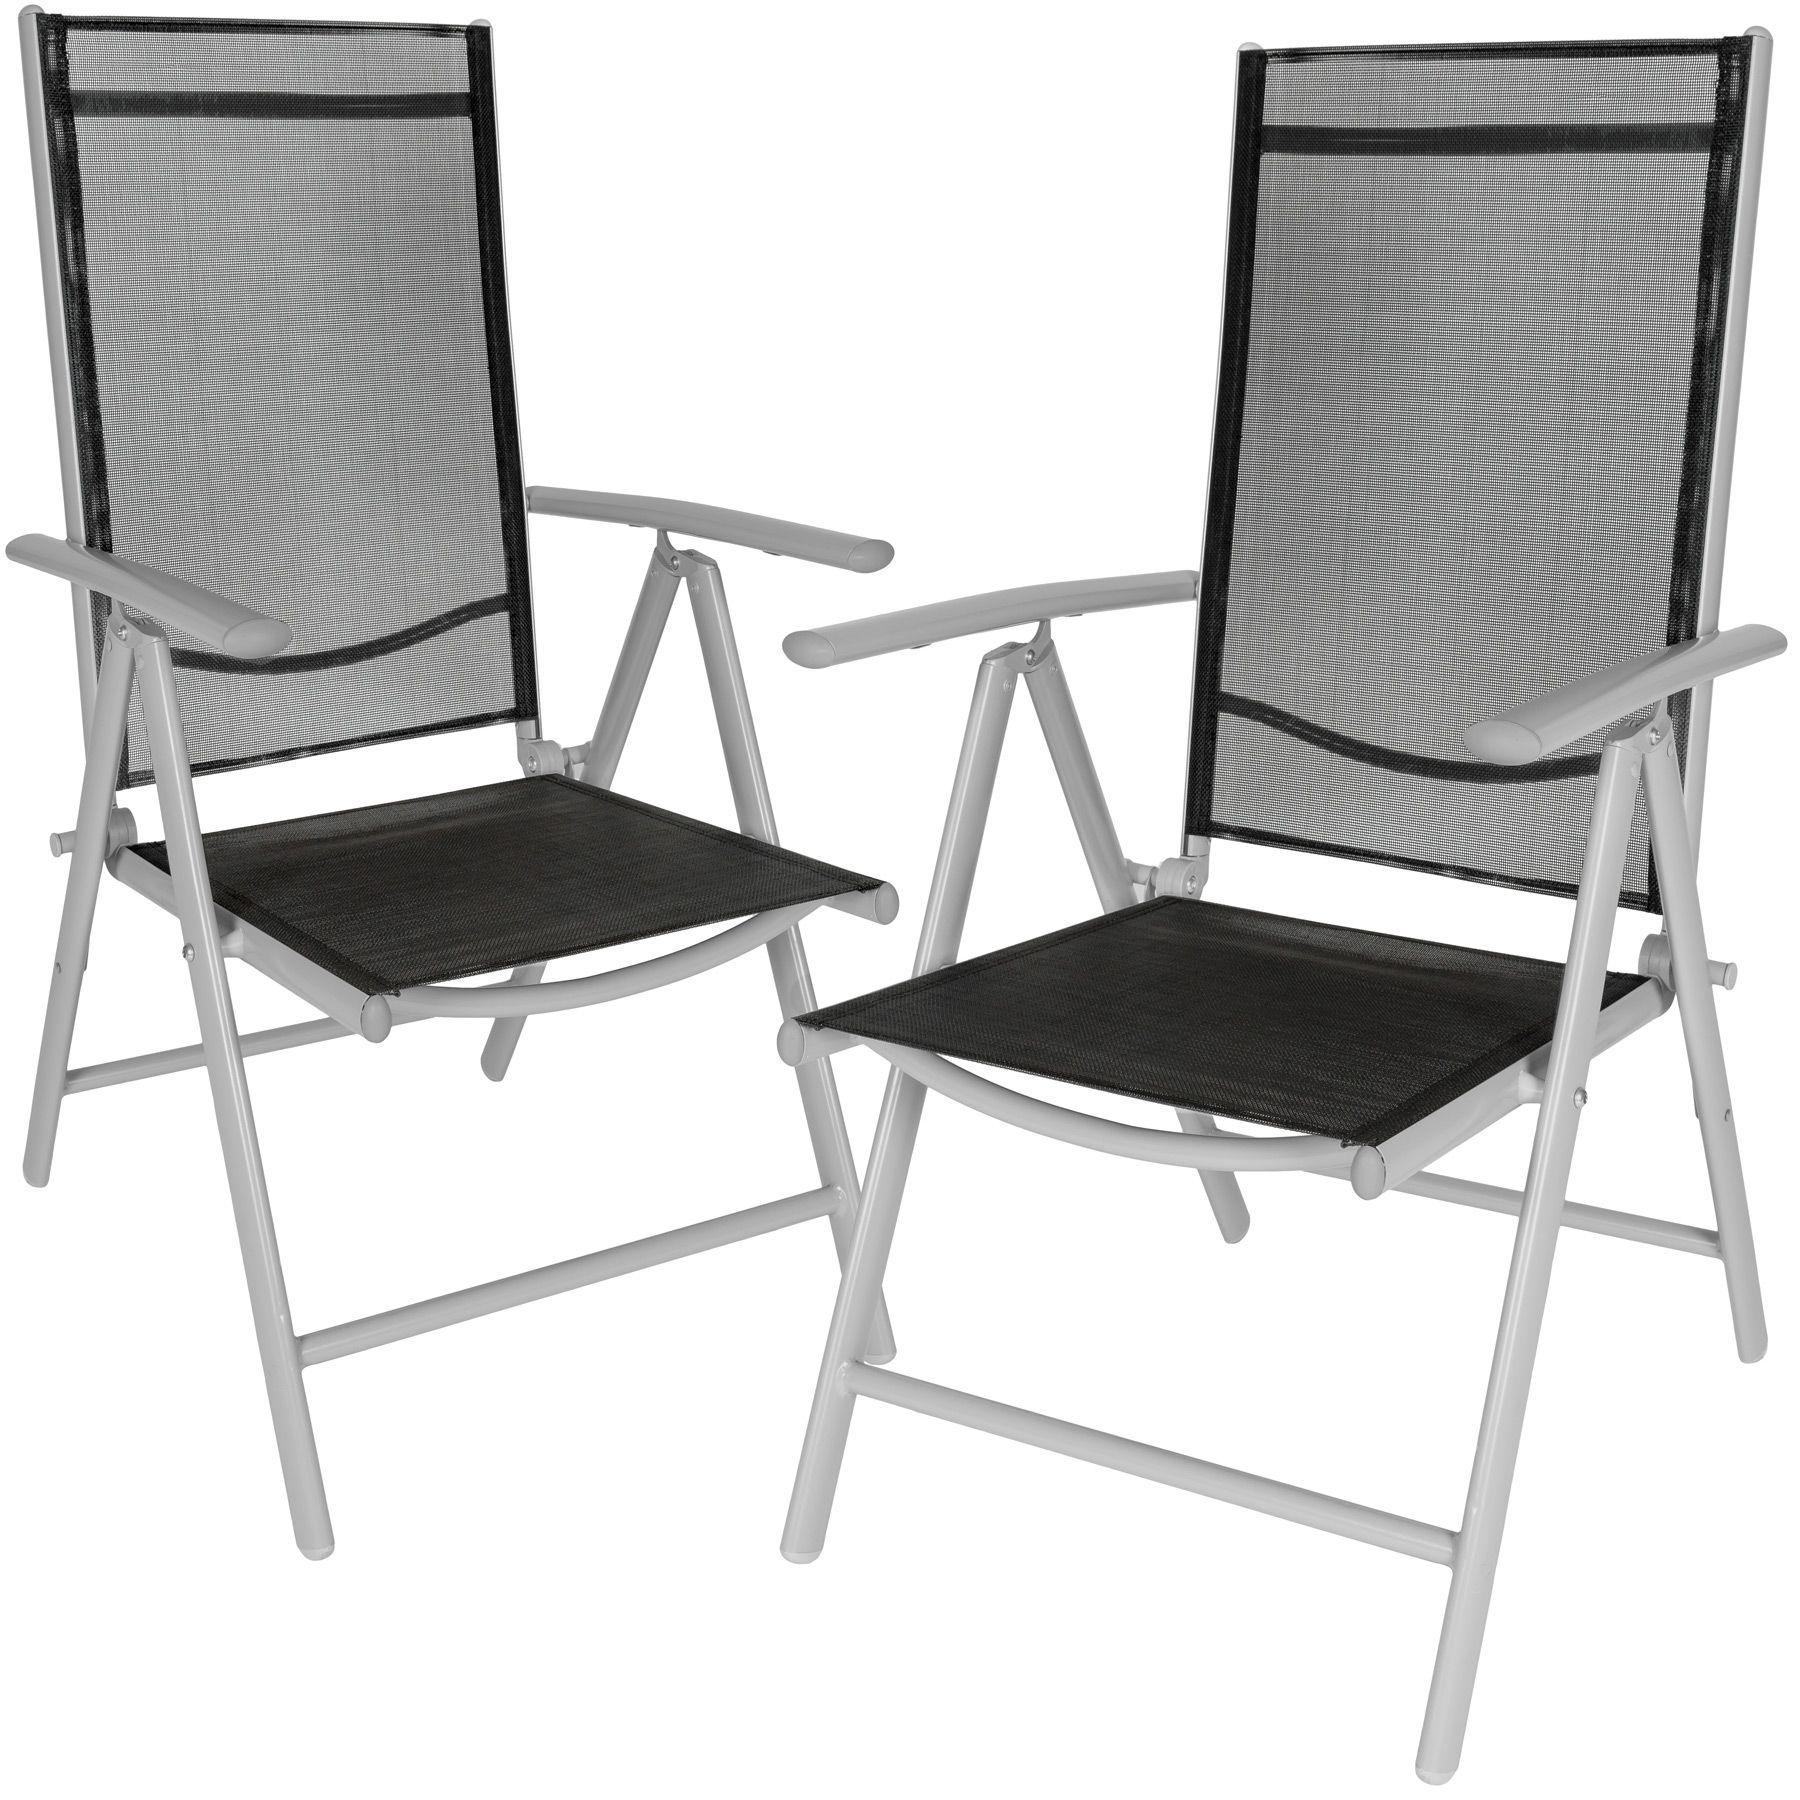 TecTake Aluminium folding garden chairs set adjustable with